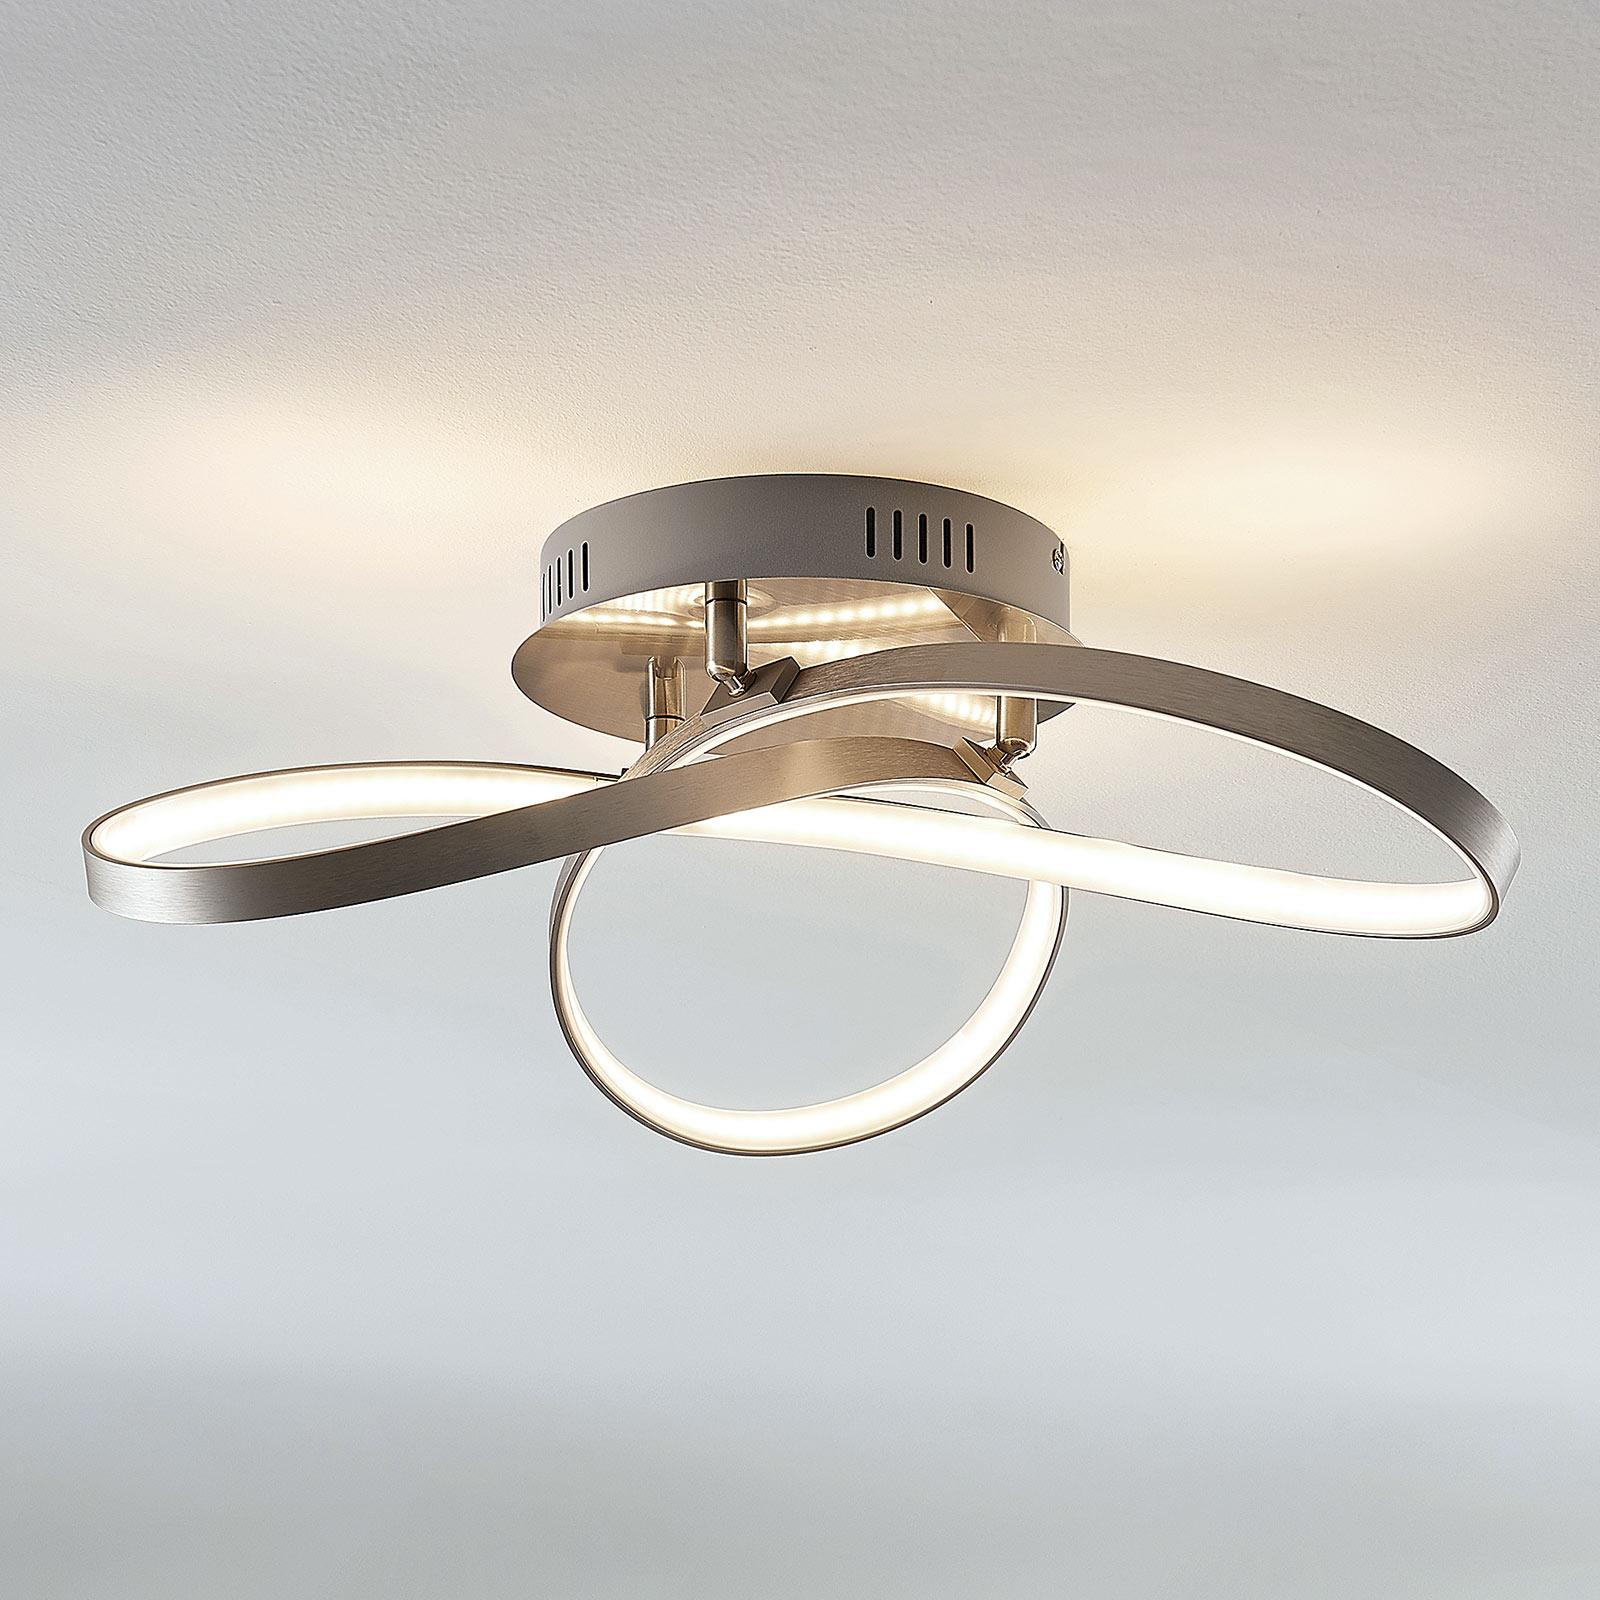 Moderne LED plafondlamp Saliha